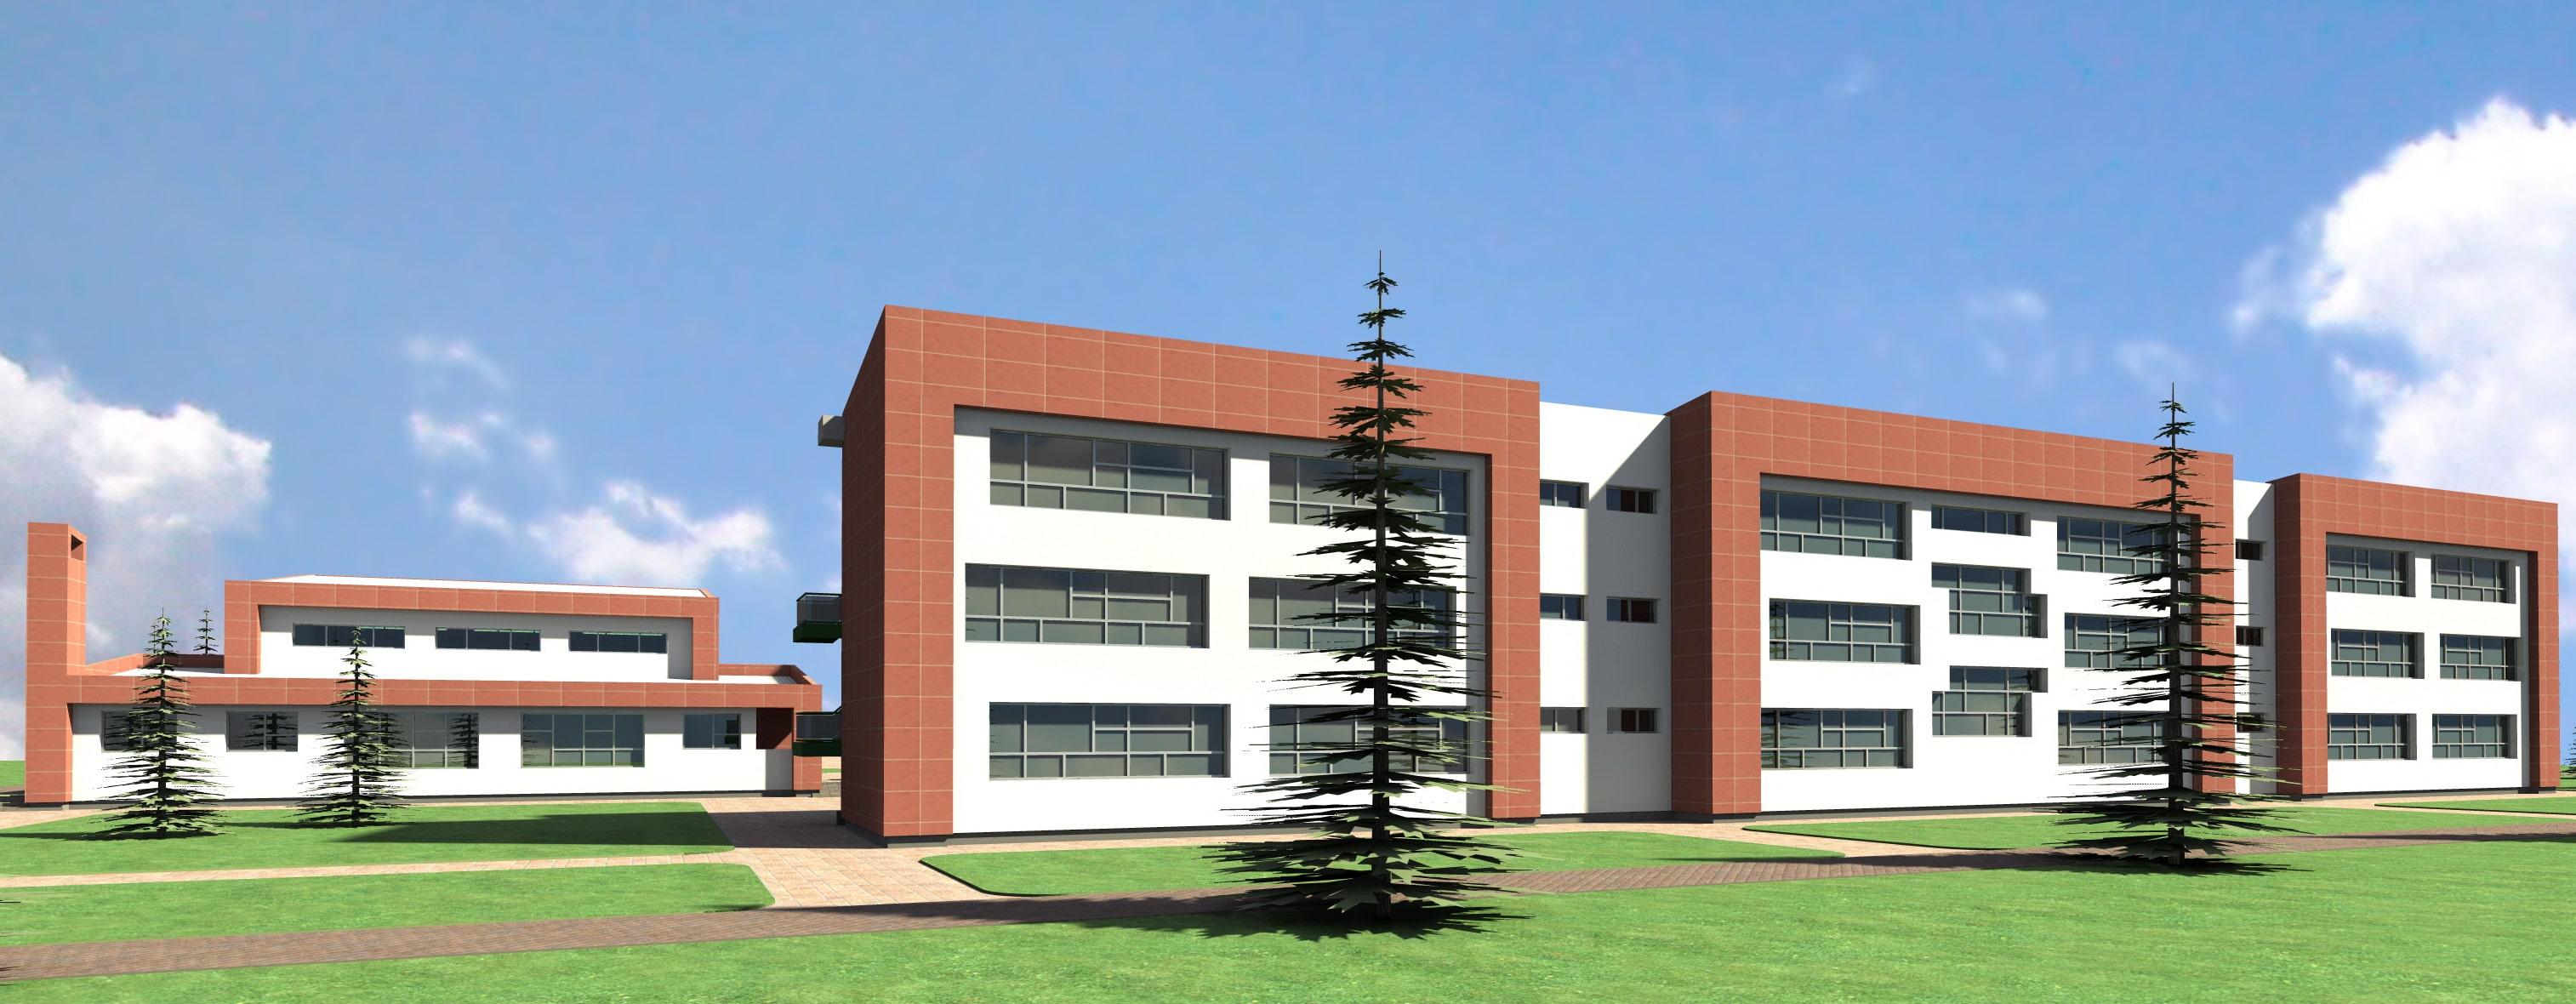 Construction of the High School in Vushtrri